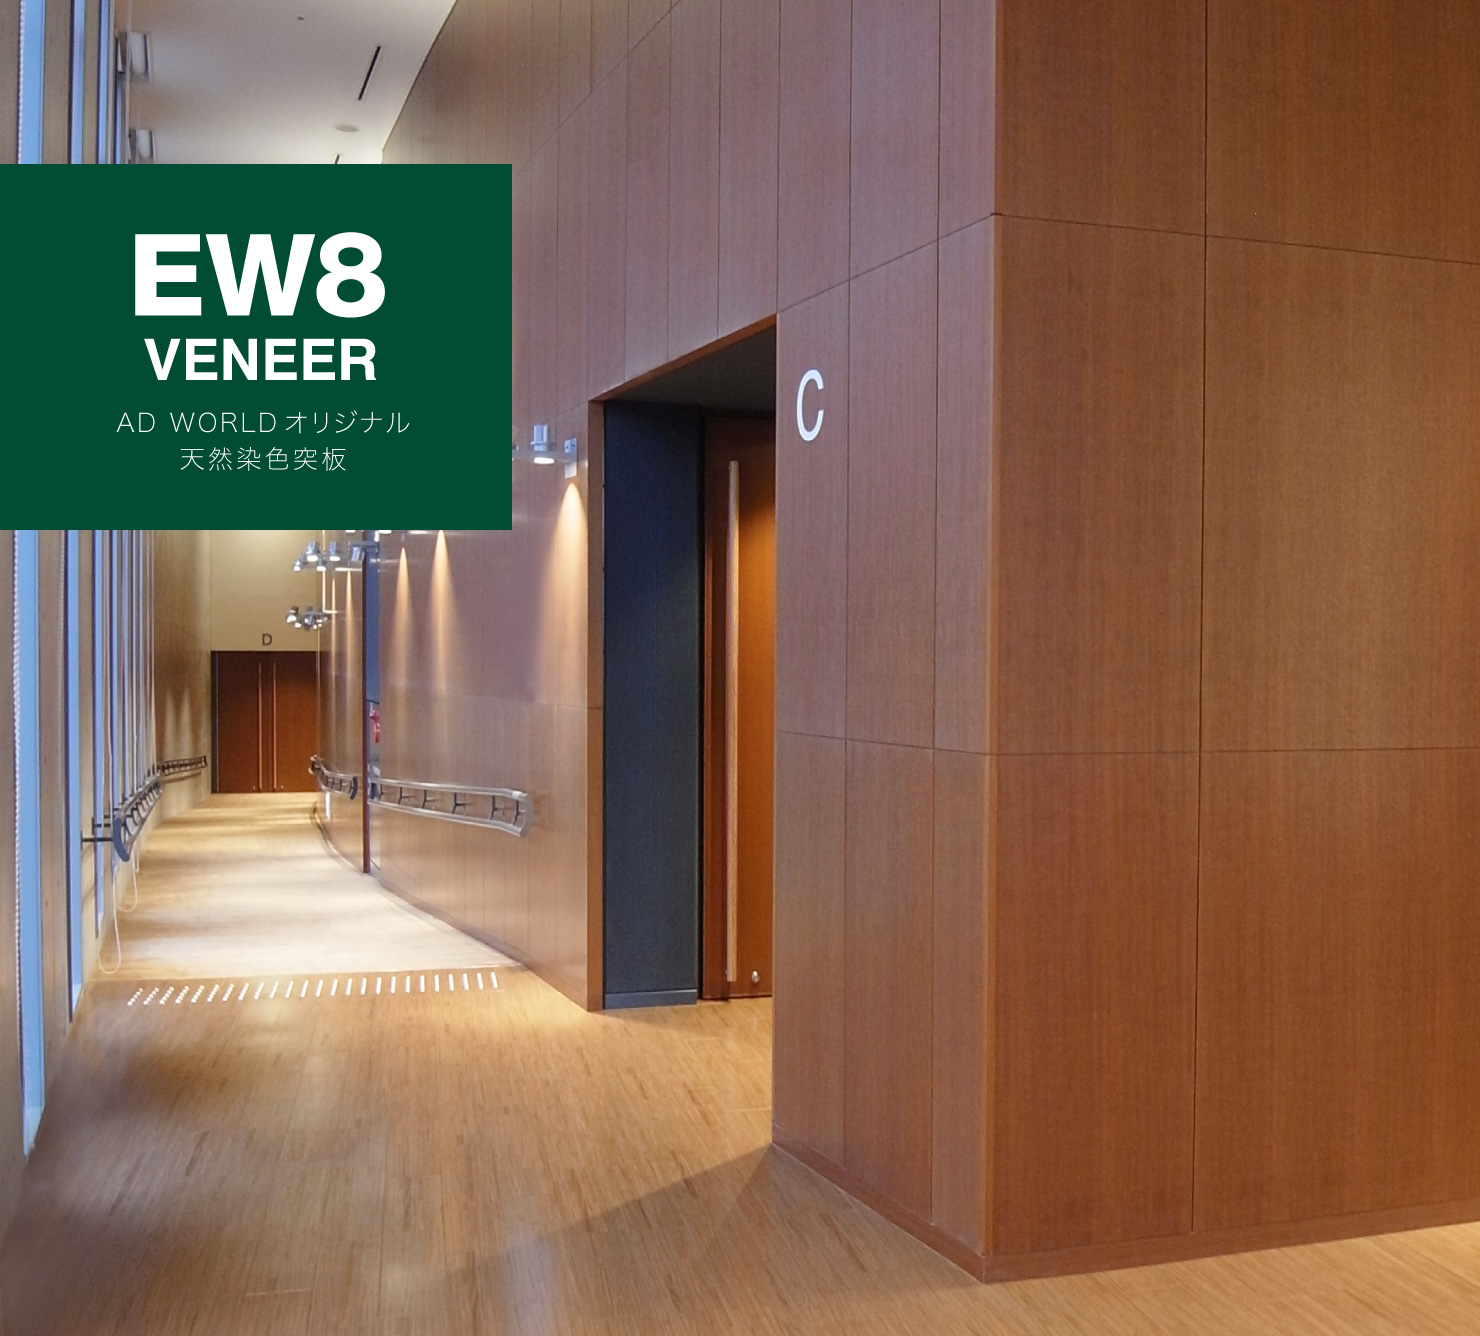 EW8 VENEER AD WORLD オリジナル 天然染色突板